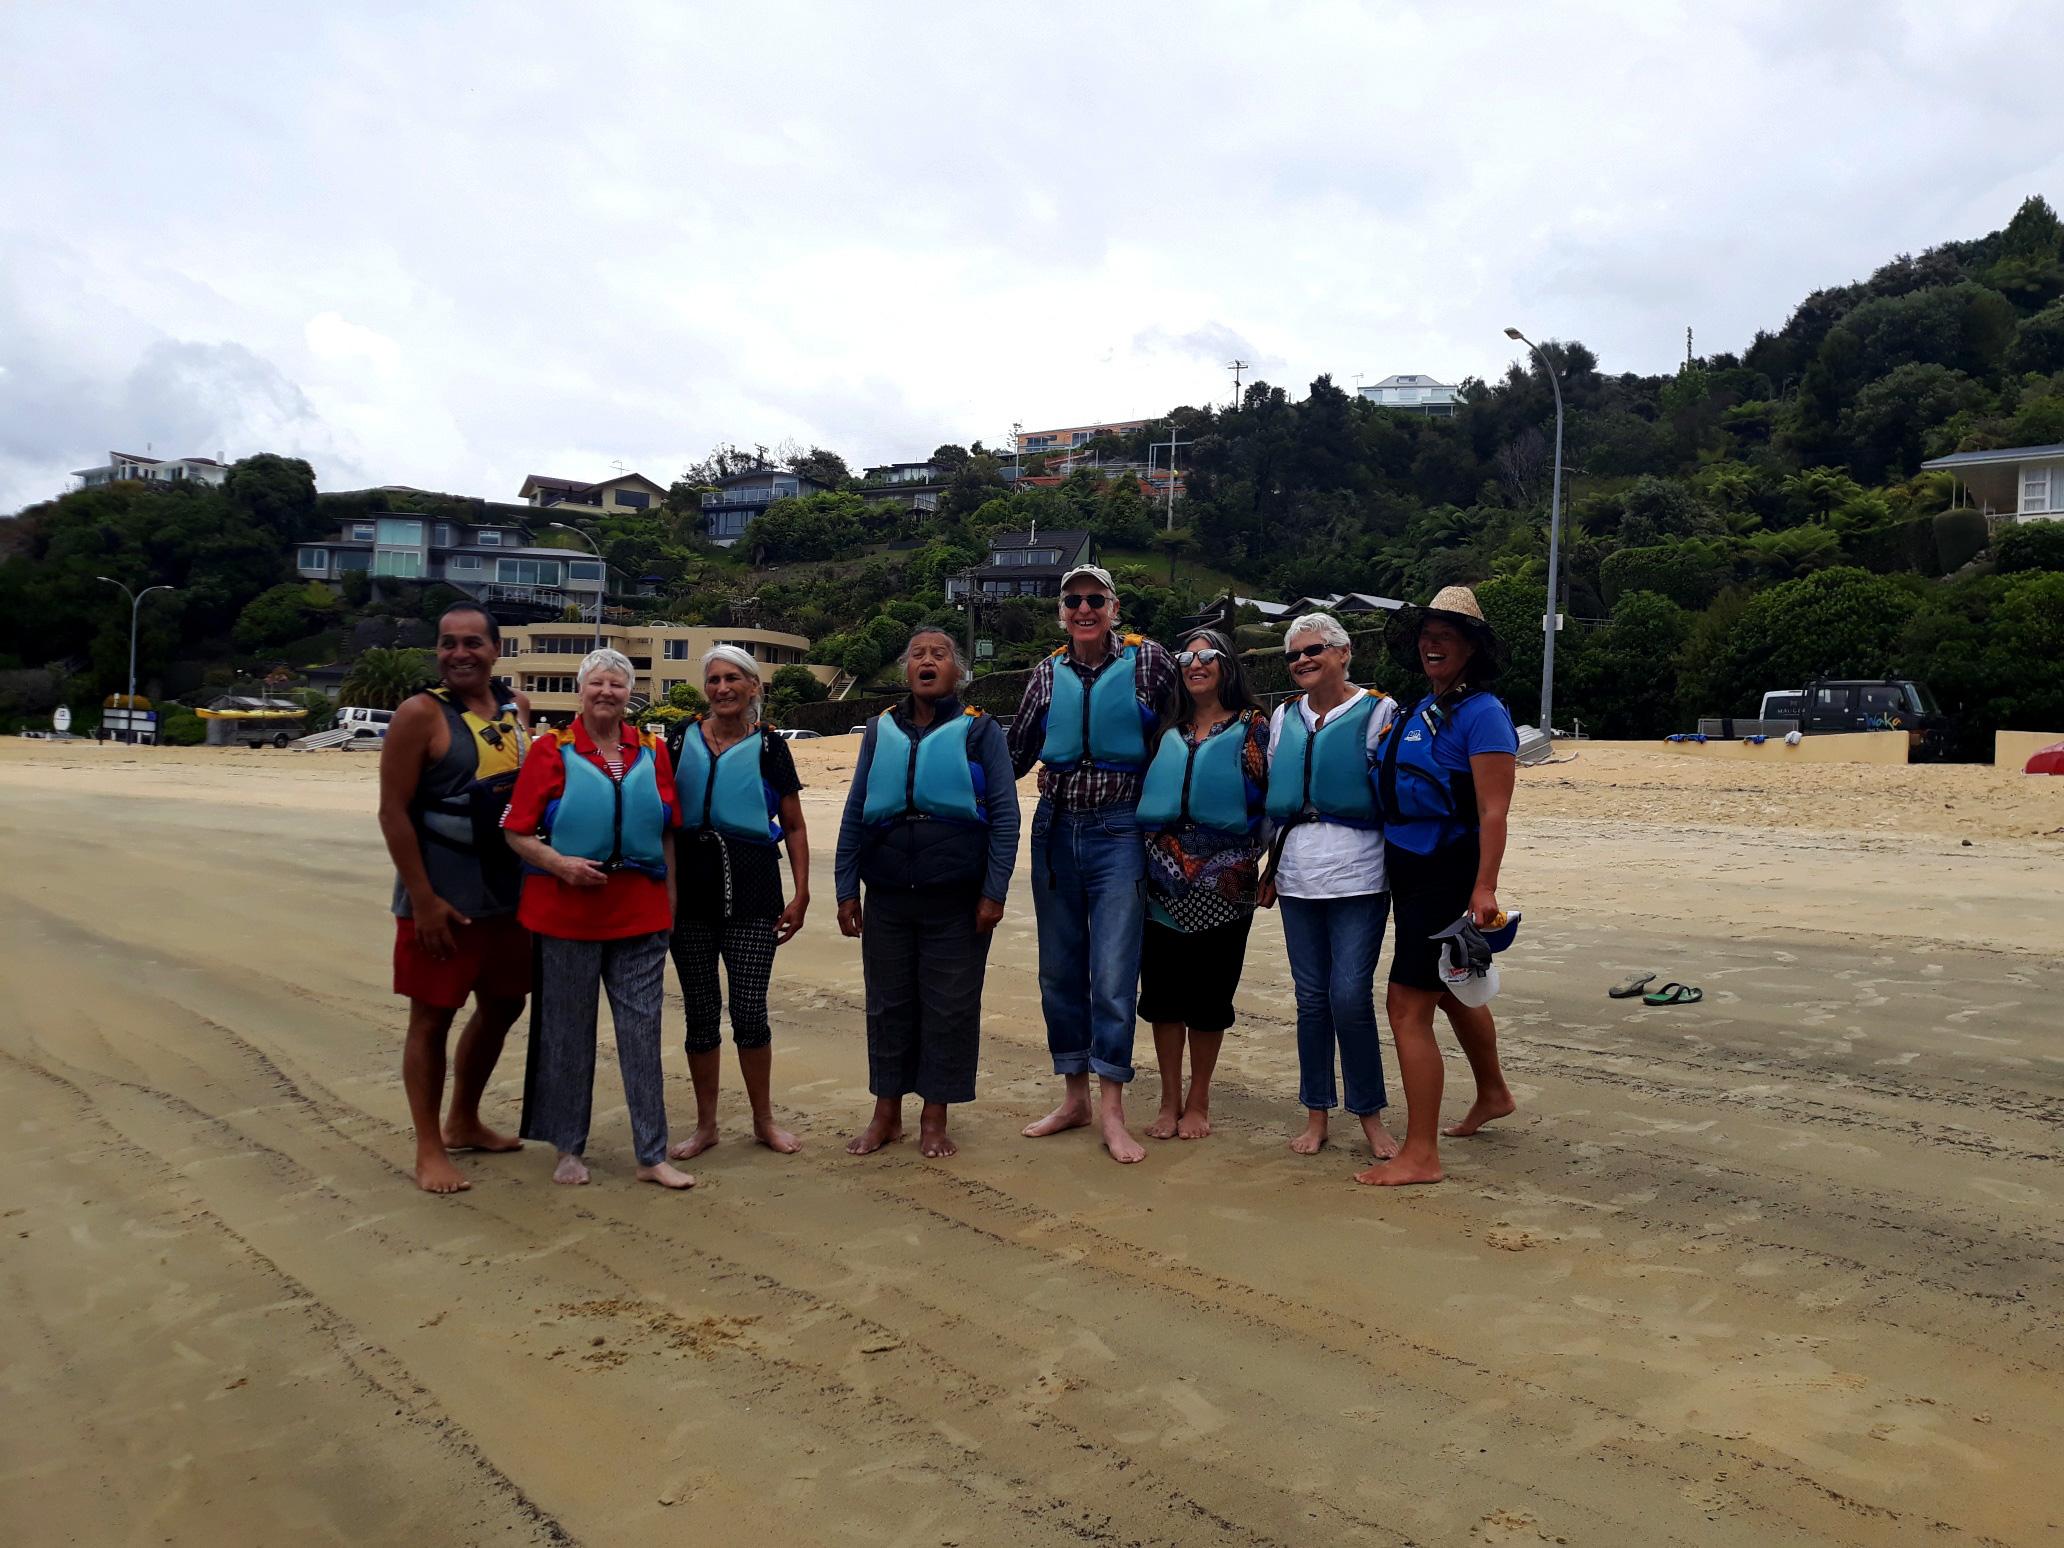 Some of the kaumātua from Rōpū Kaukau and Te Oranga Pai, a contingent of Raranga group doing a presentation for their appreciation